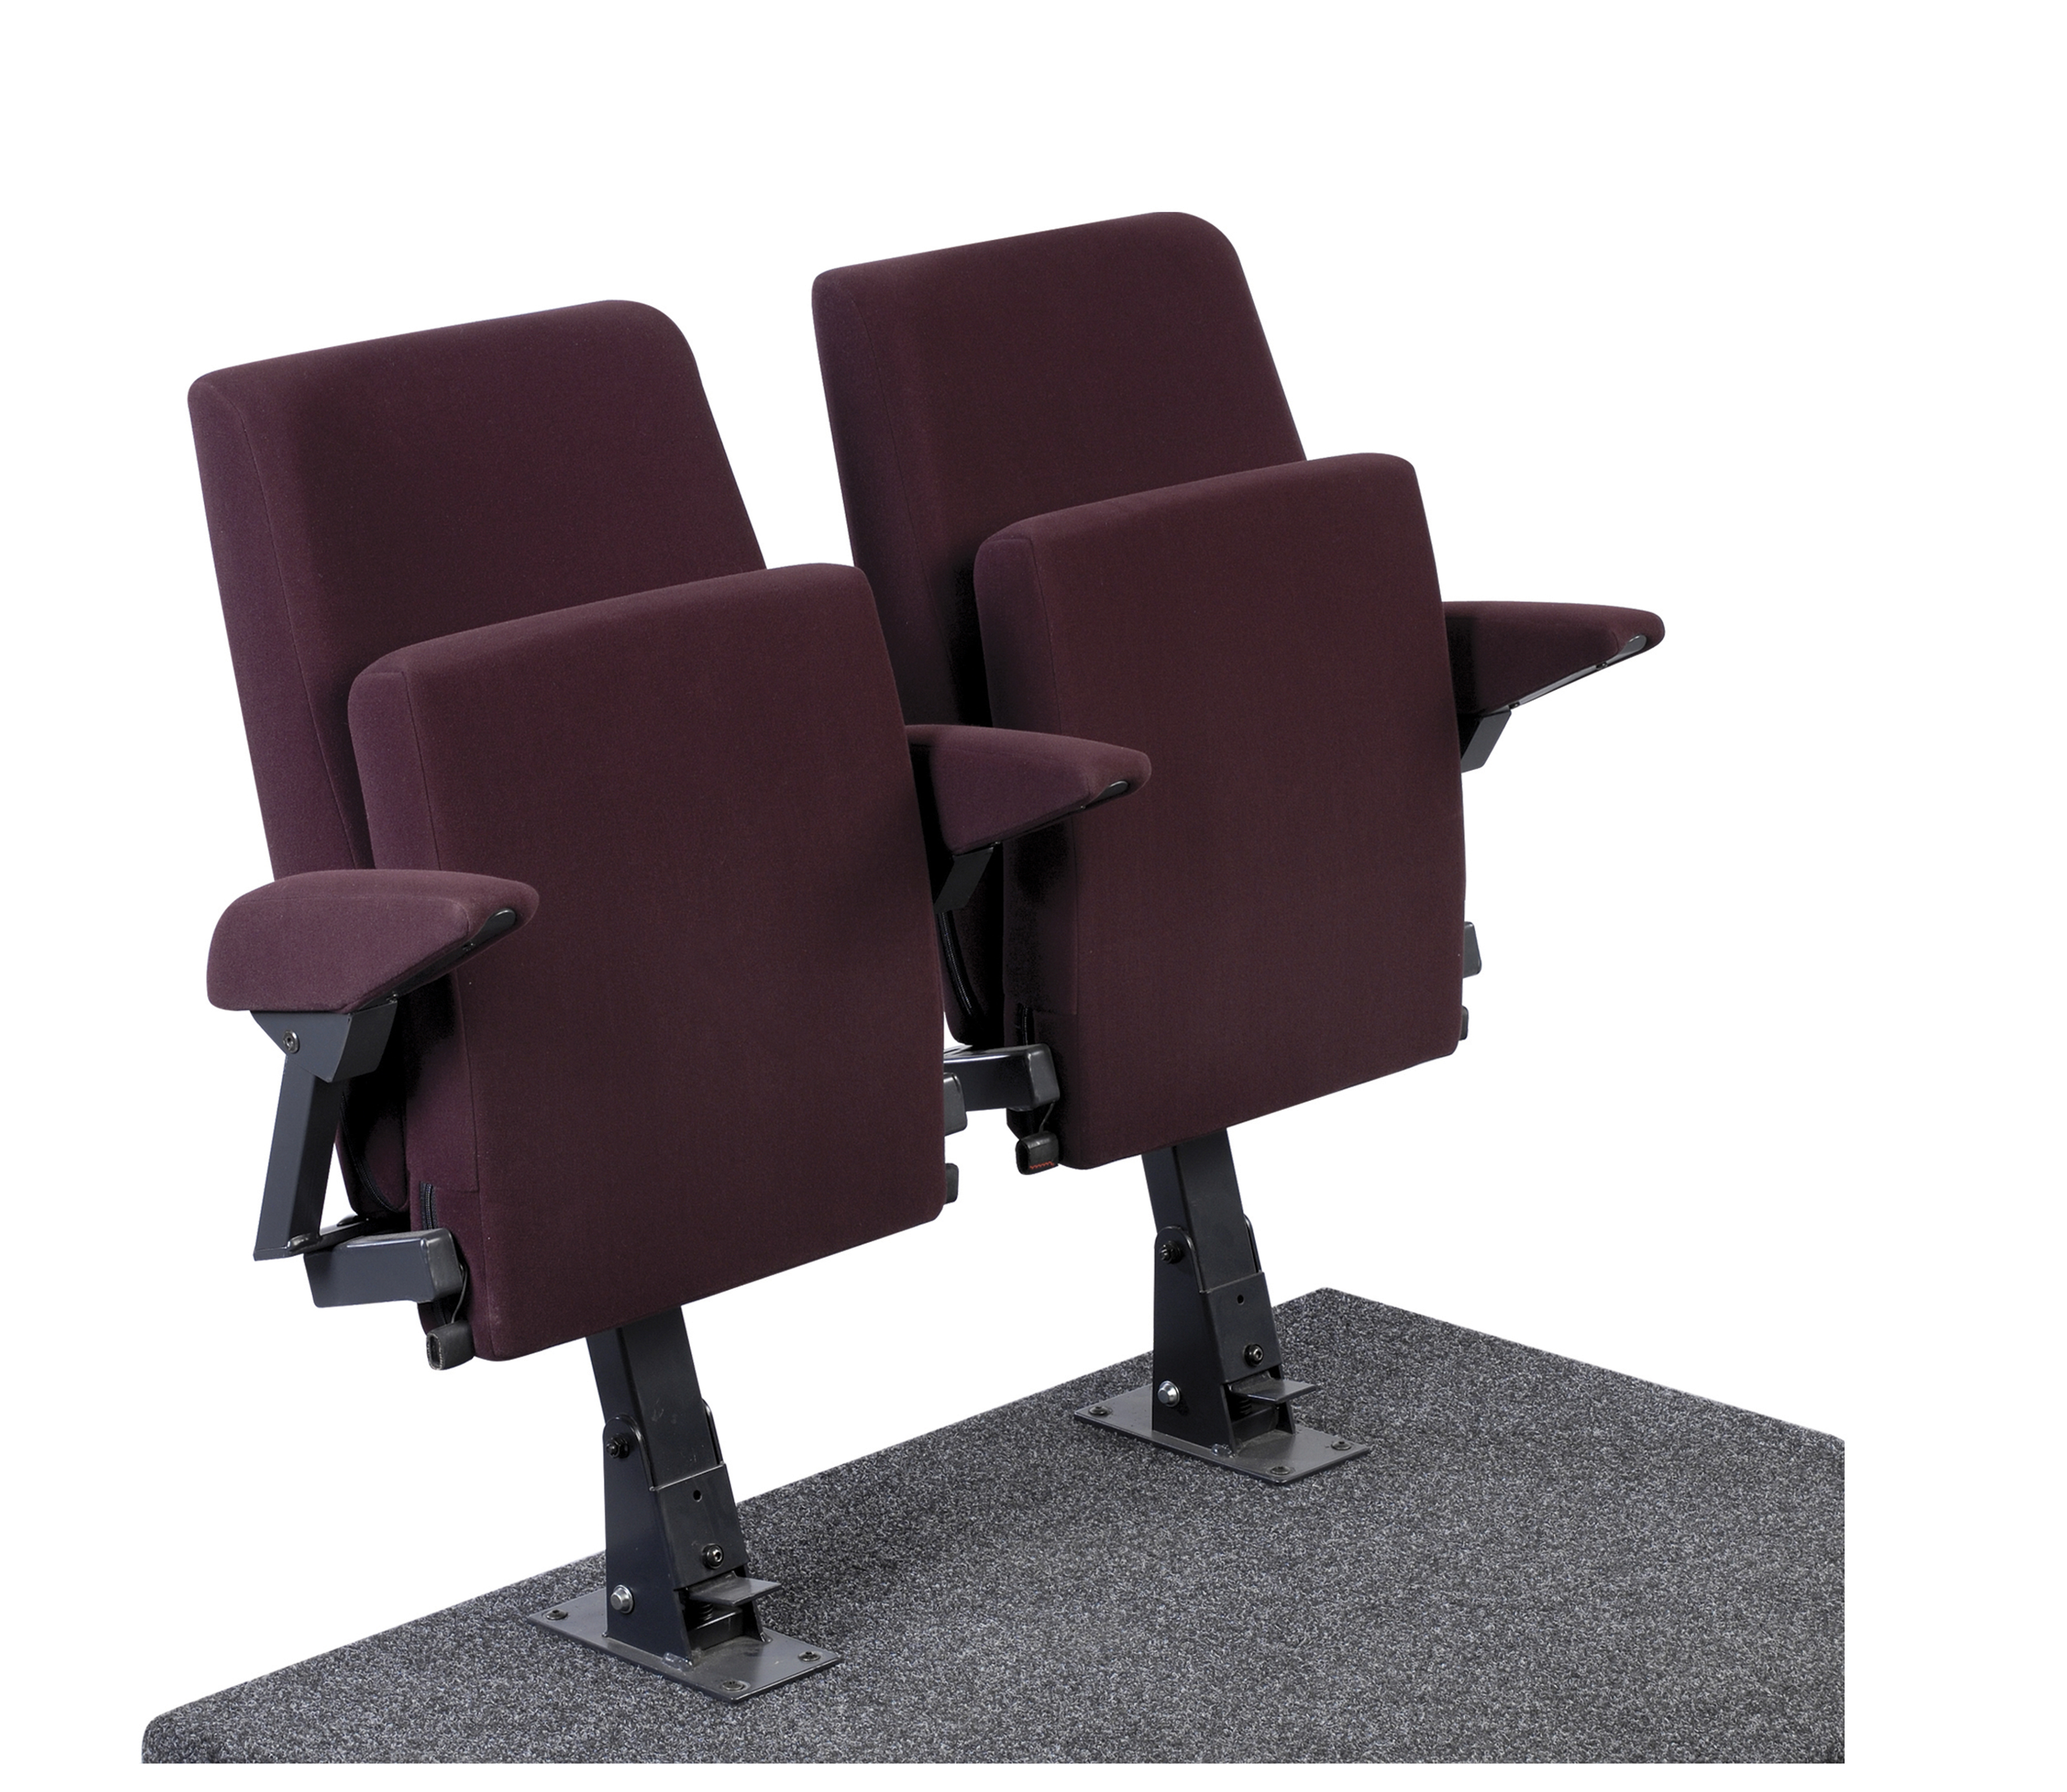 Grandada stol til teleskopisktribune